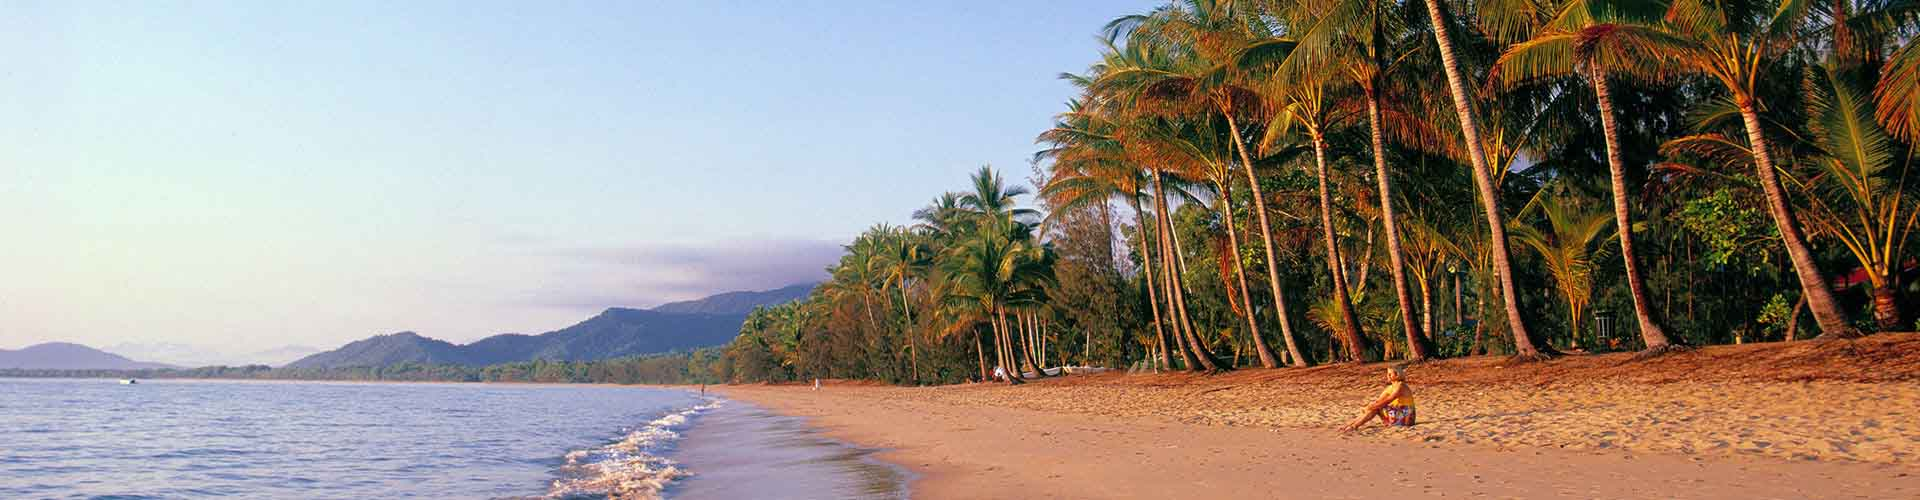 Cairns – Albergues em Cairns. Mapas para Cairns, Fotos e Avaliações para cada Albergue em Cairns.